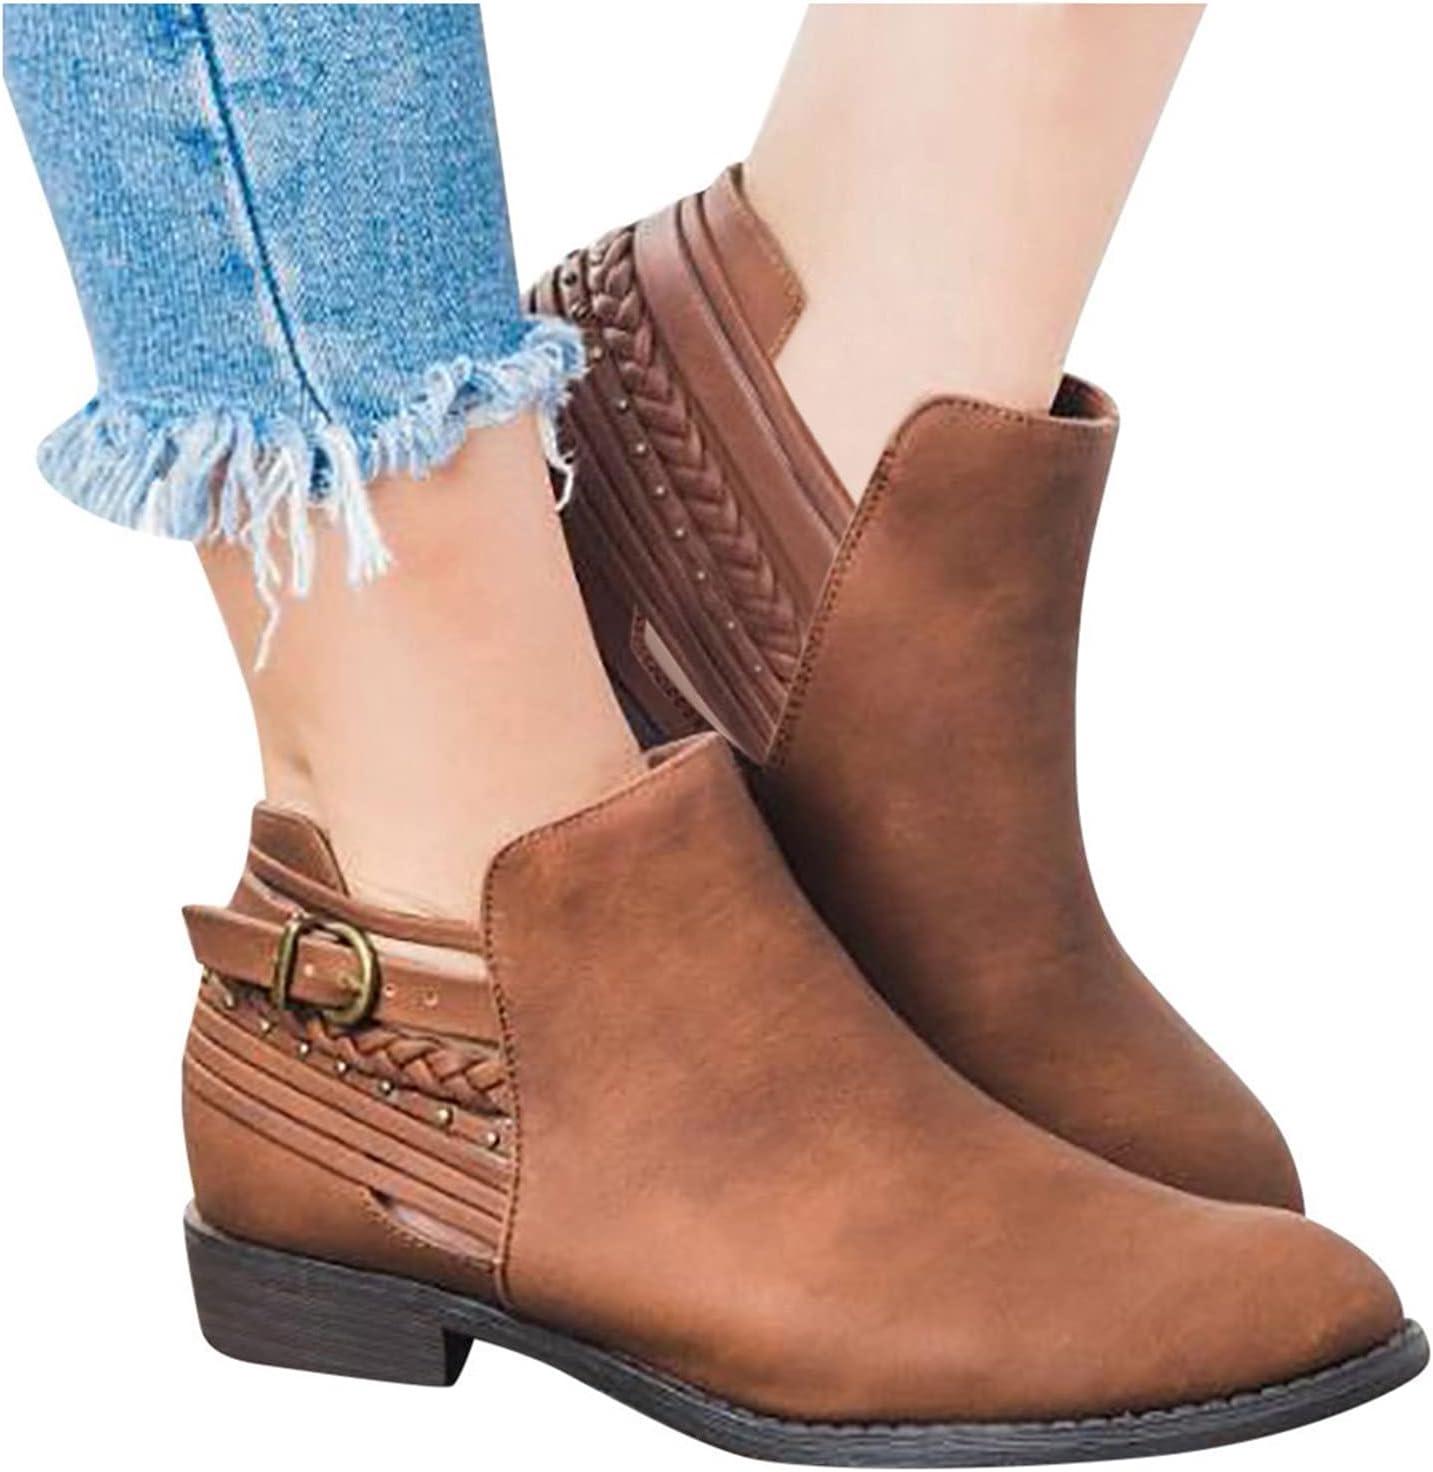 NOLDARES Boots for Women Winter Warm Roman Retro Flat Short Booties Comfort Ankle Zipper Boots Squared Toe Snow Boots